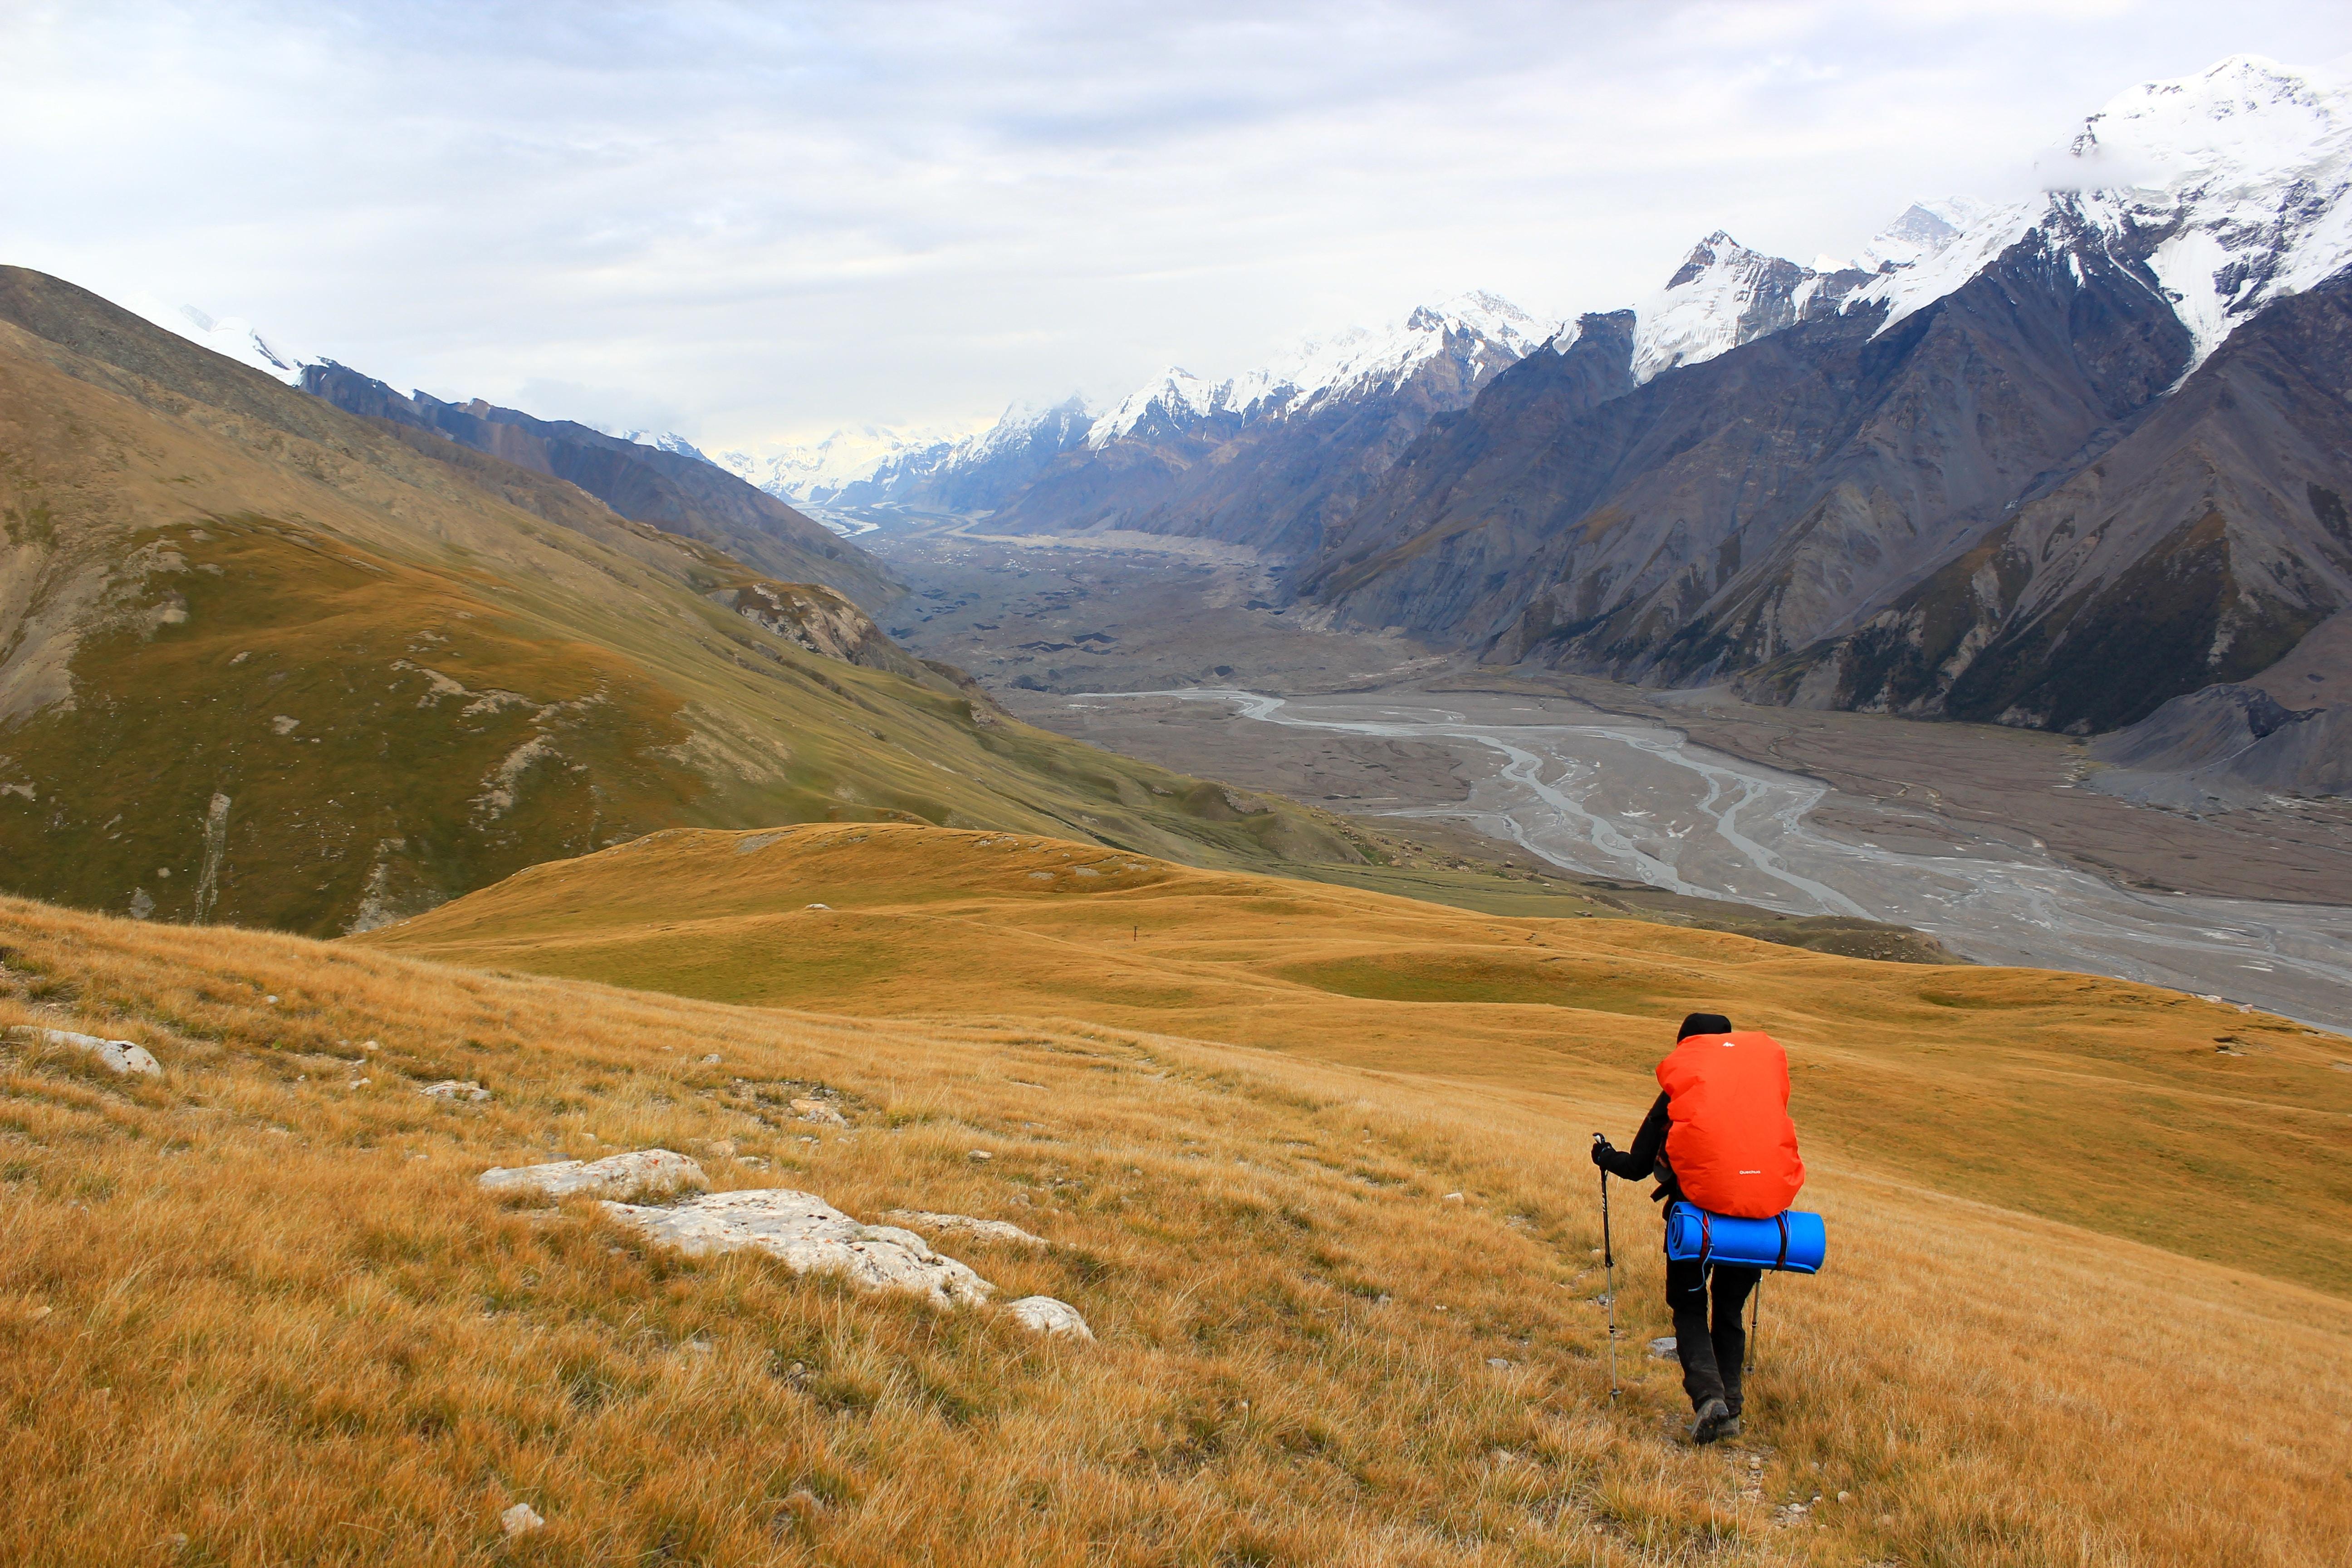 man with hiking bag climbing on mountains